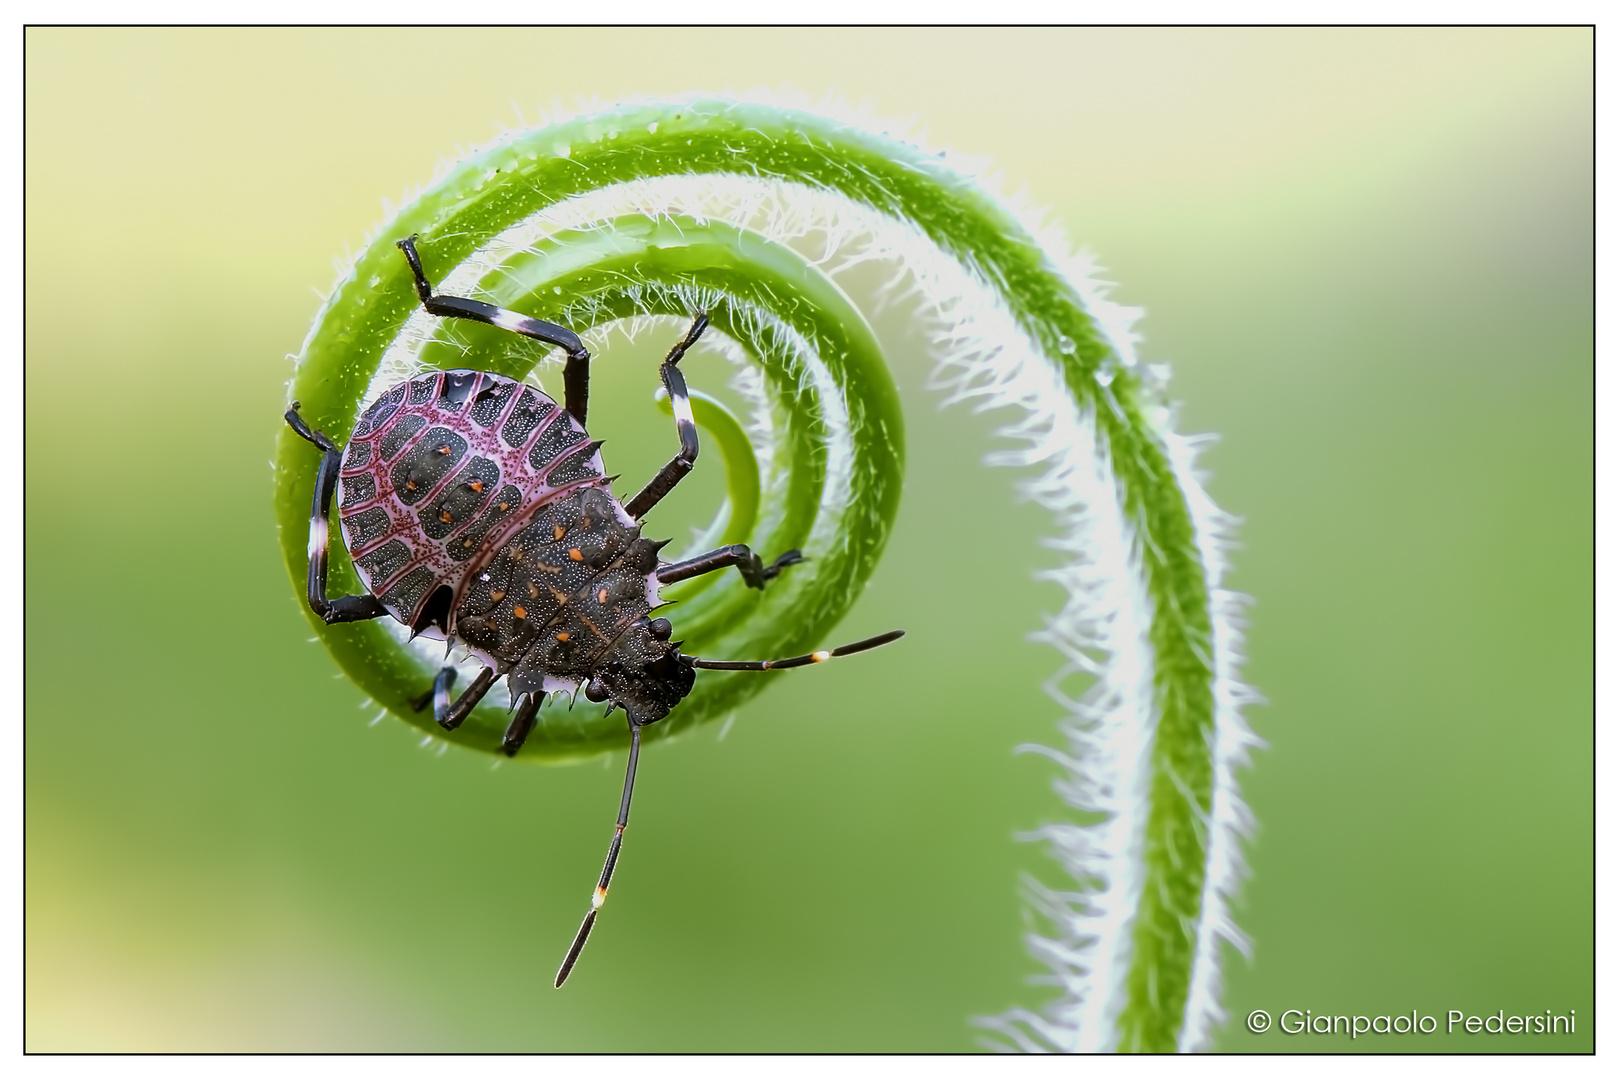 On the spiral (Halyomorpha halys)